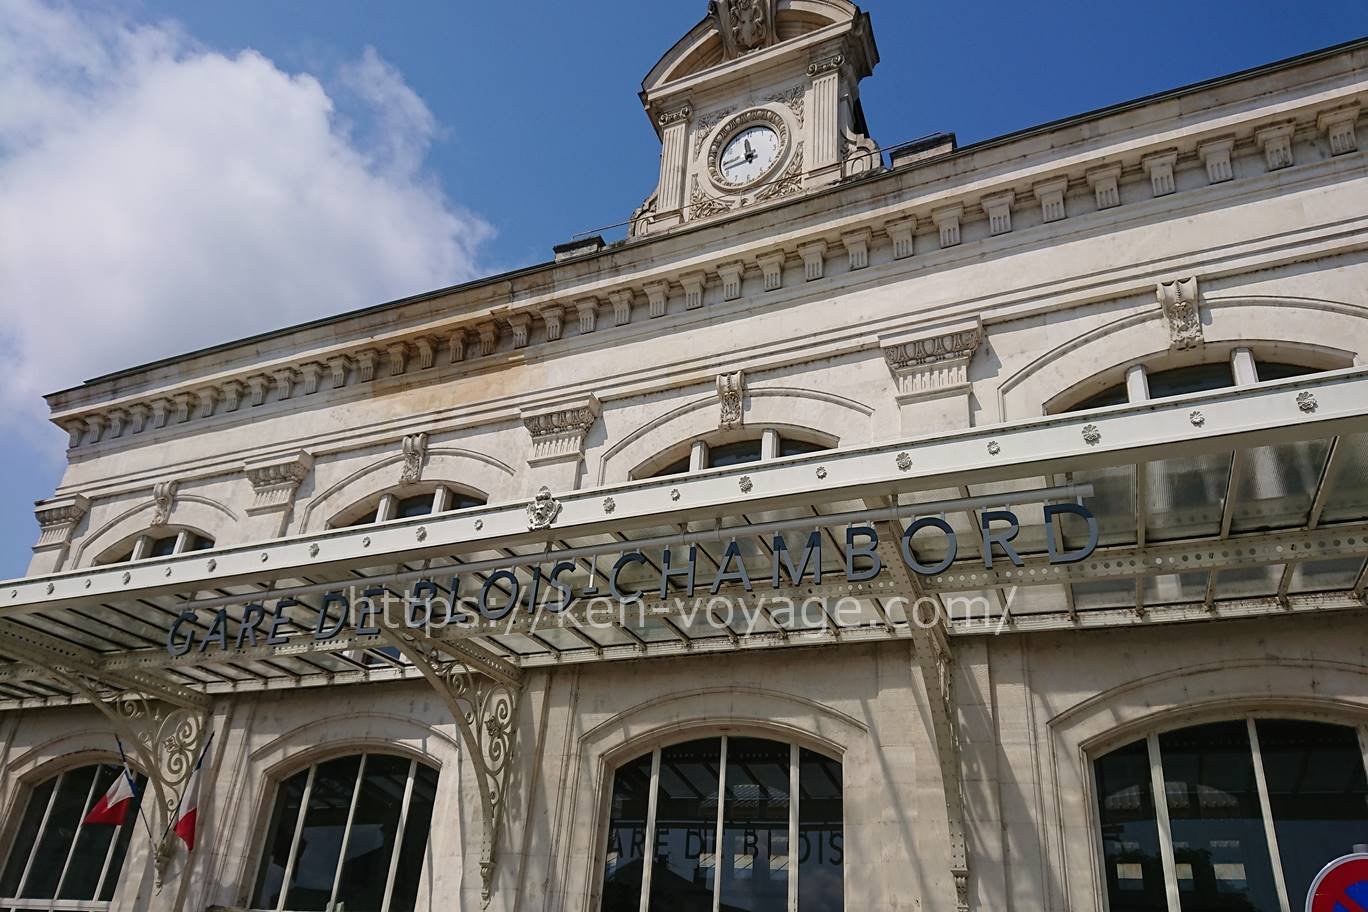 Gare de Blois Chambord